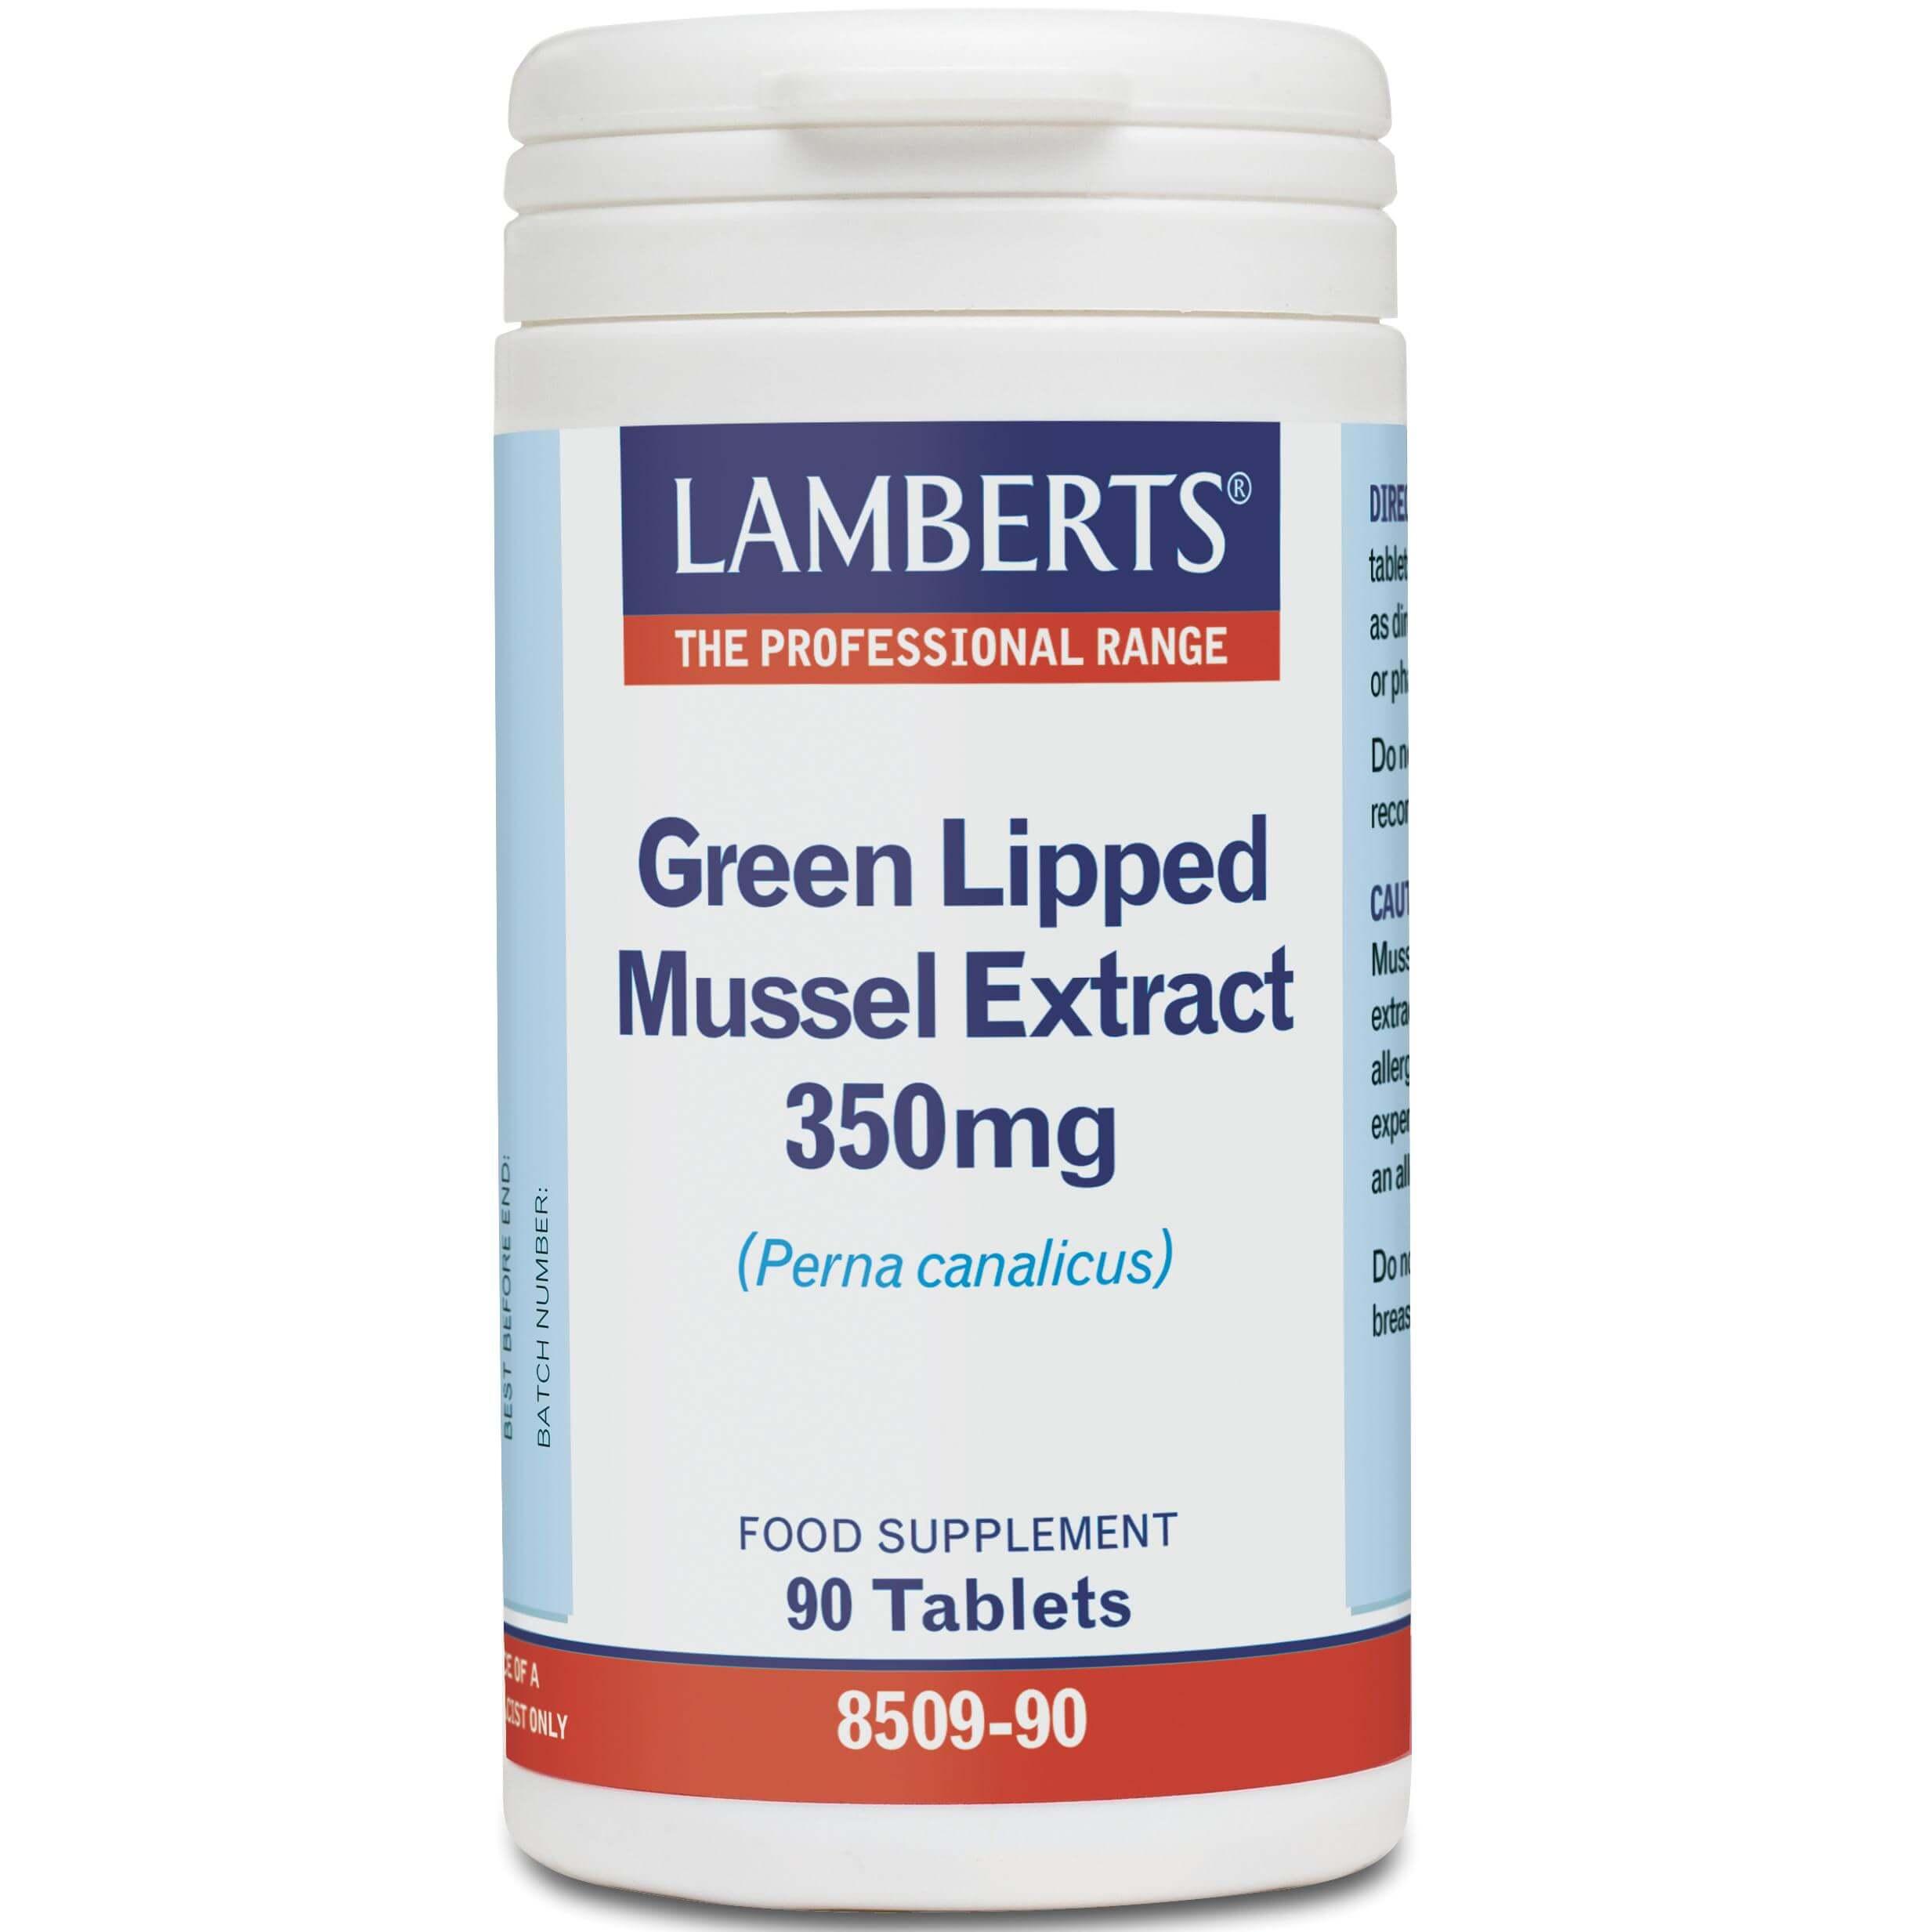 Lamberts Green Lipped Mussel Extract Συμπλήρωμα Διατροφής για την Διατήρηση της Ευκινησίας των Αρθρώσεων350mg 90Tabs